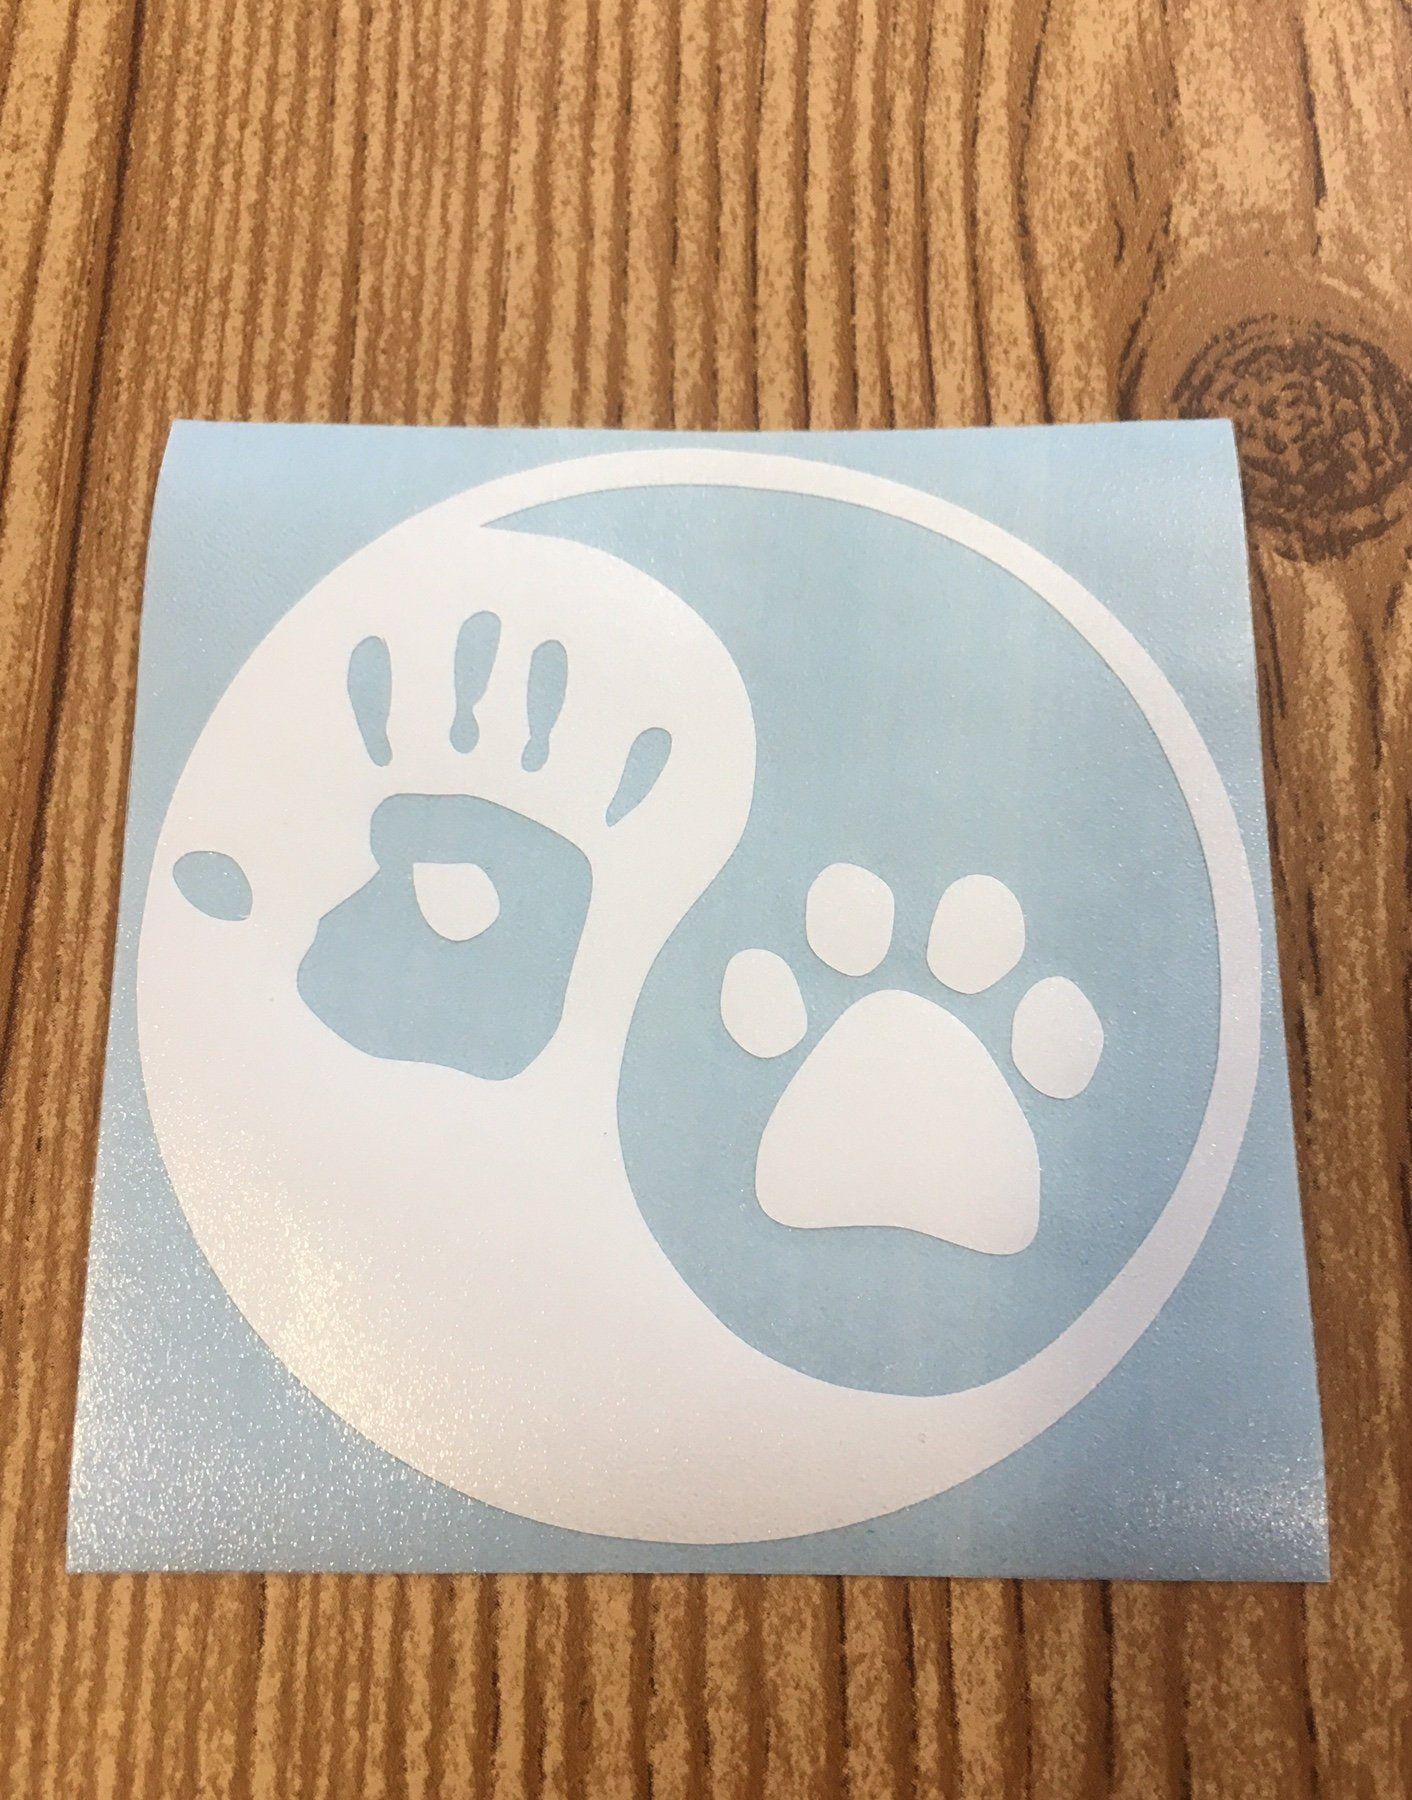 Yin and yang hand print paw print vinyl decal sticker car decal yeti sticker water bottle sticker laptop sticker gift idea